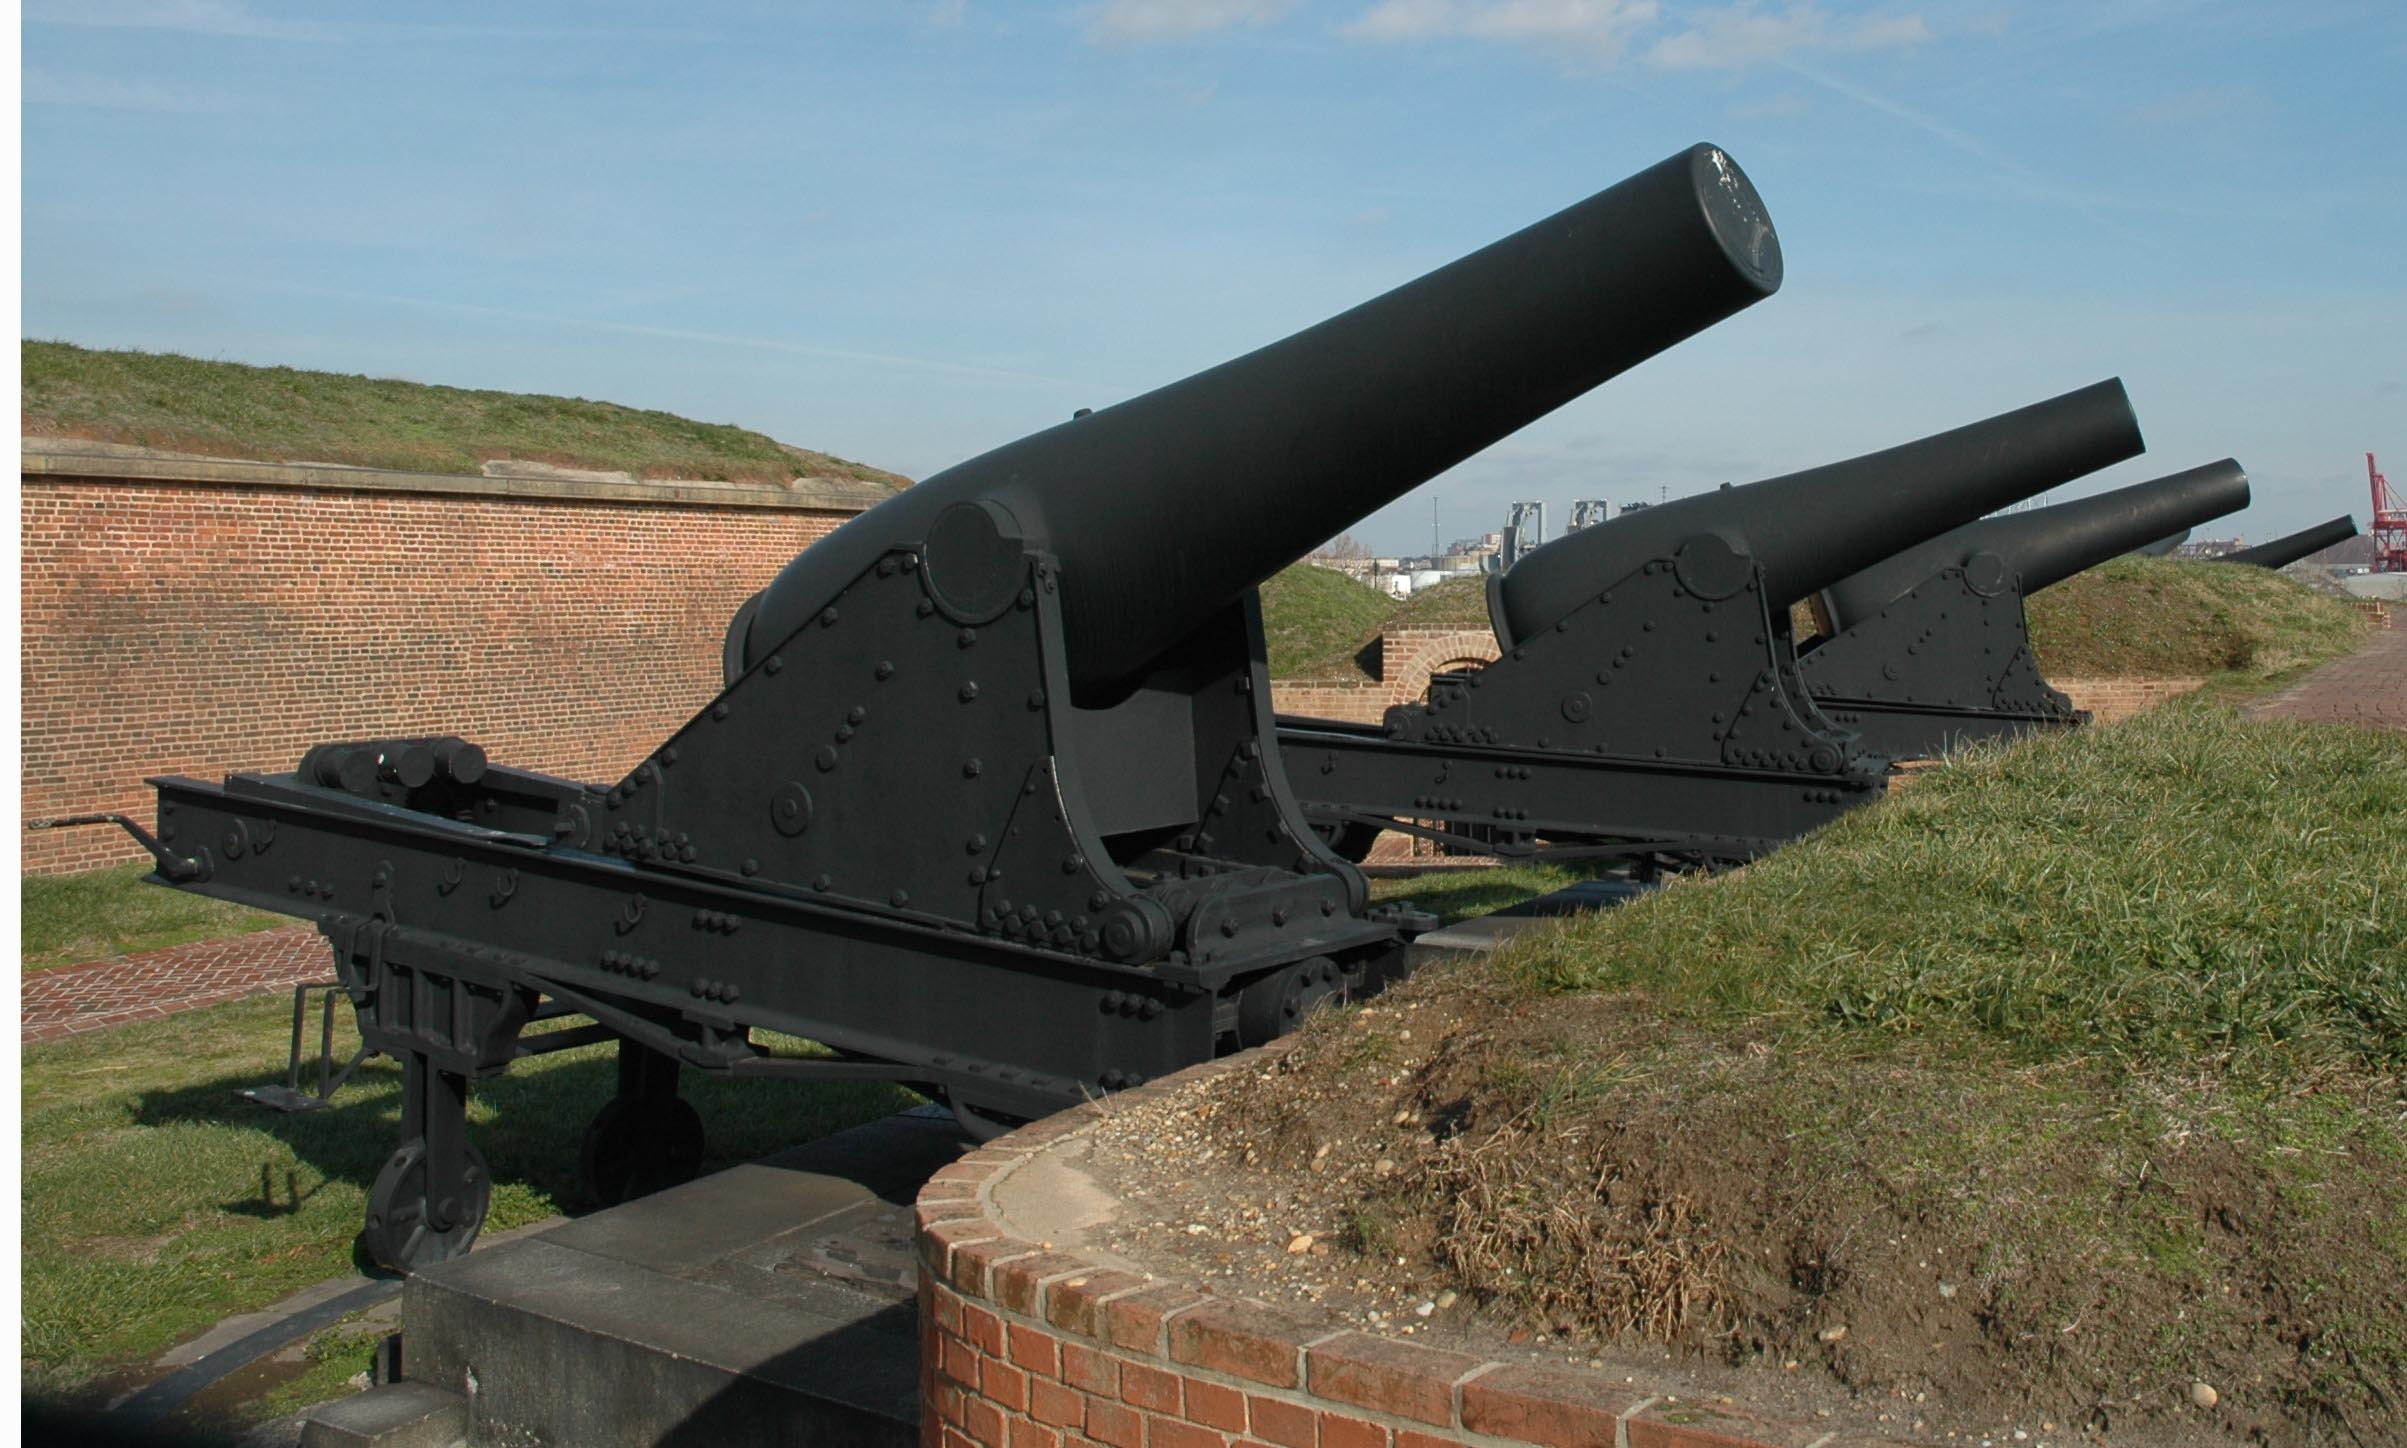 Rodman gun emplacement at Fort McHenry